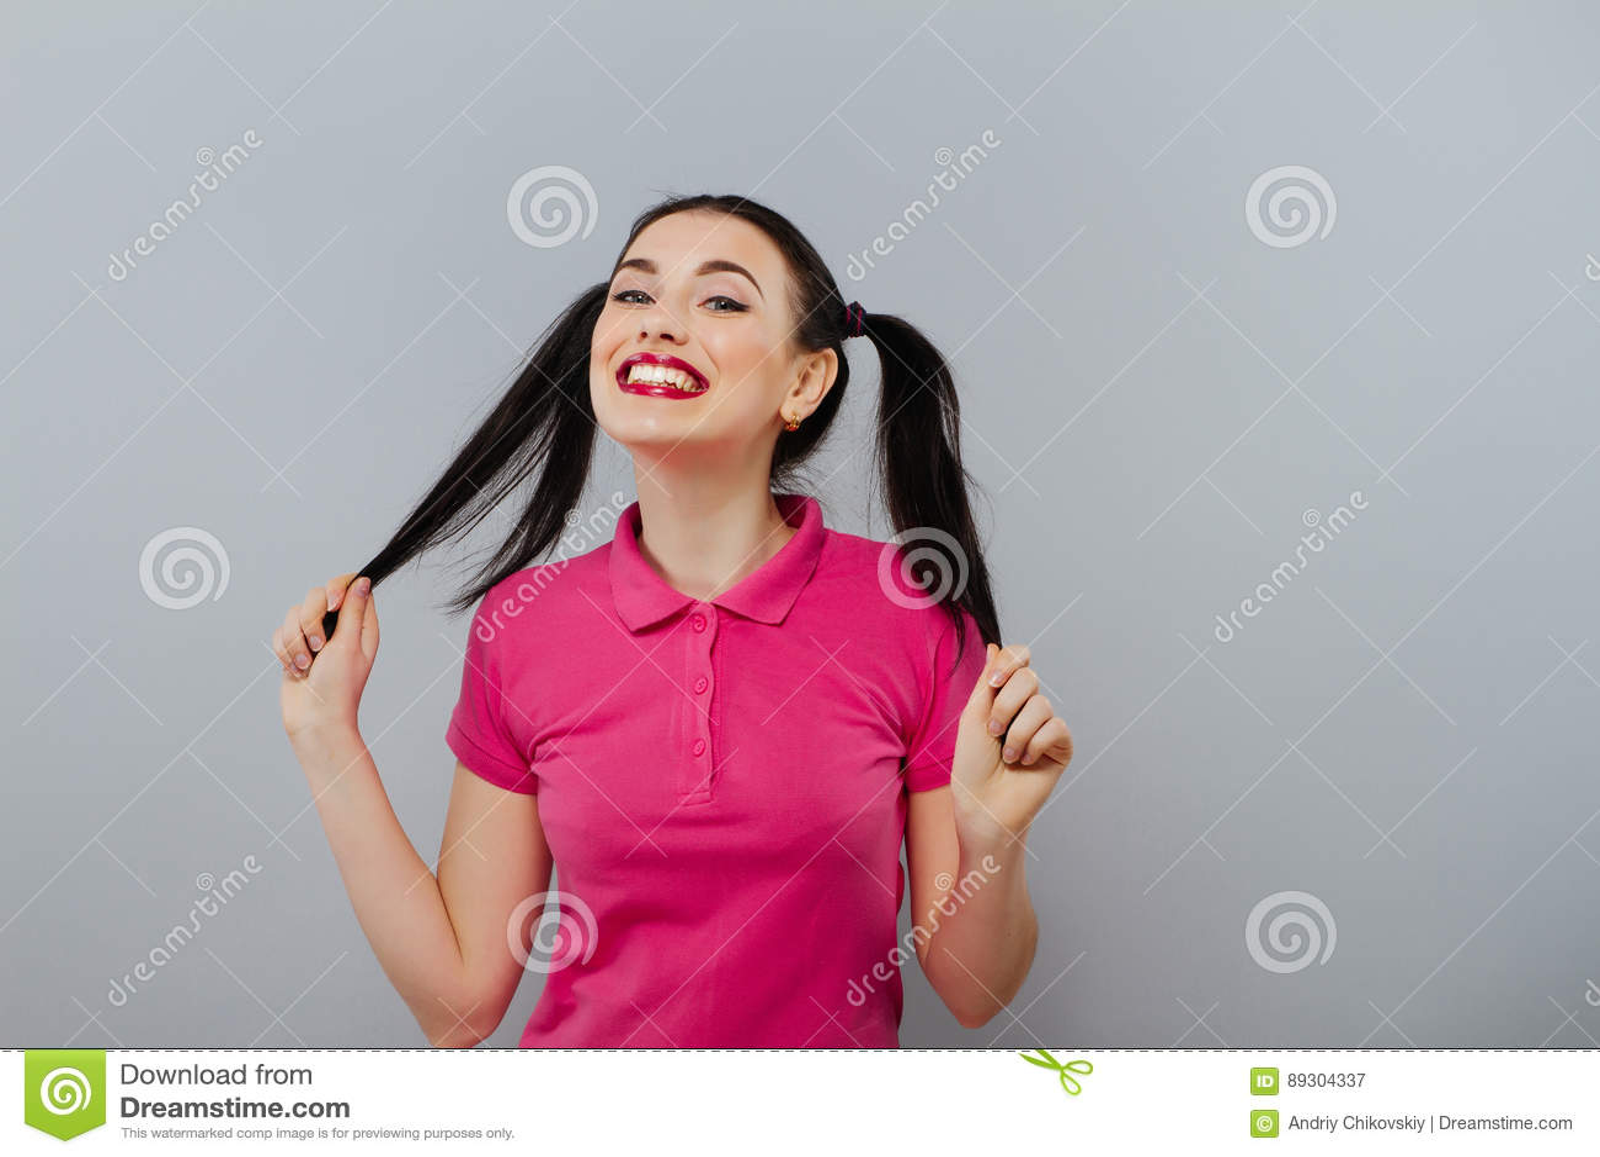 persona 3 dating presenter